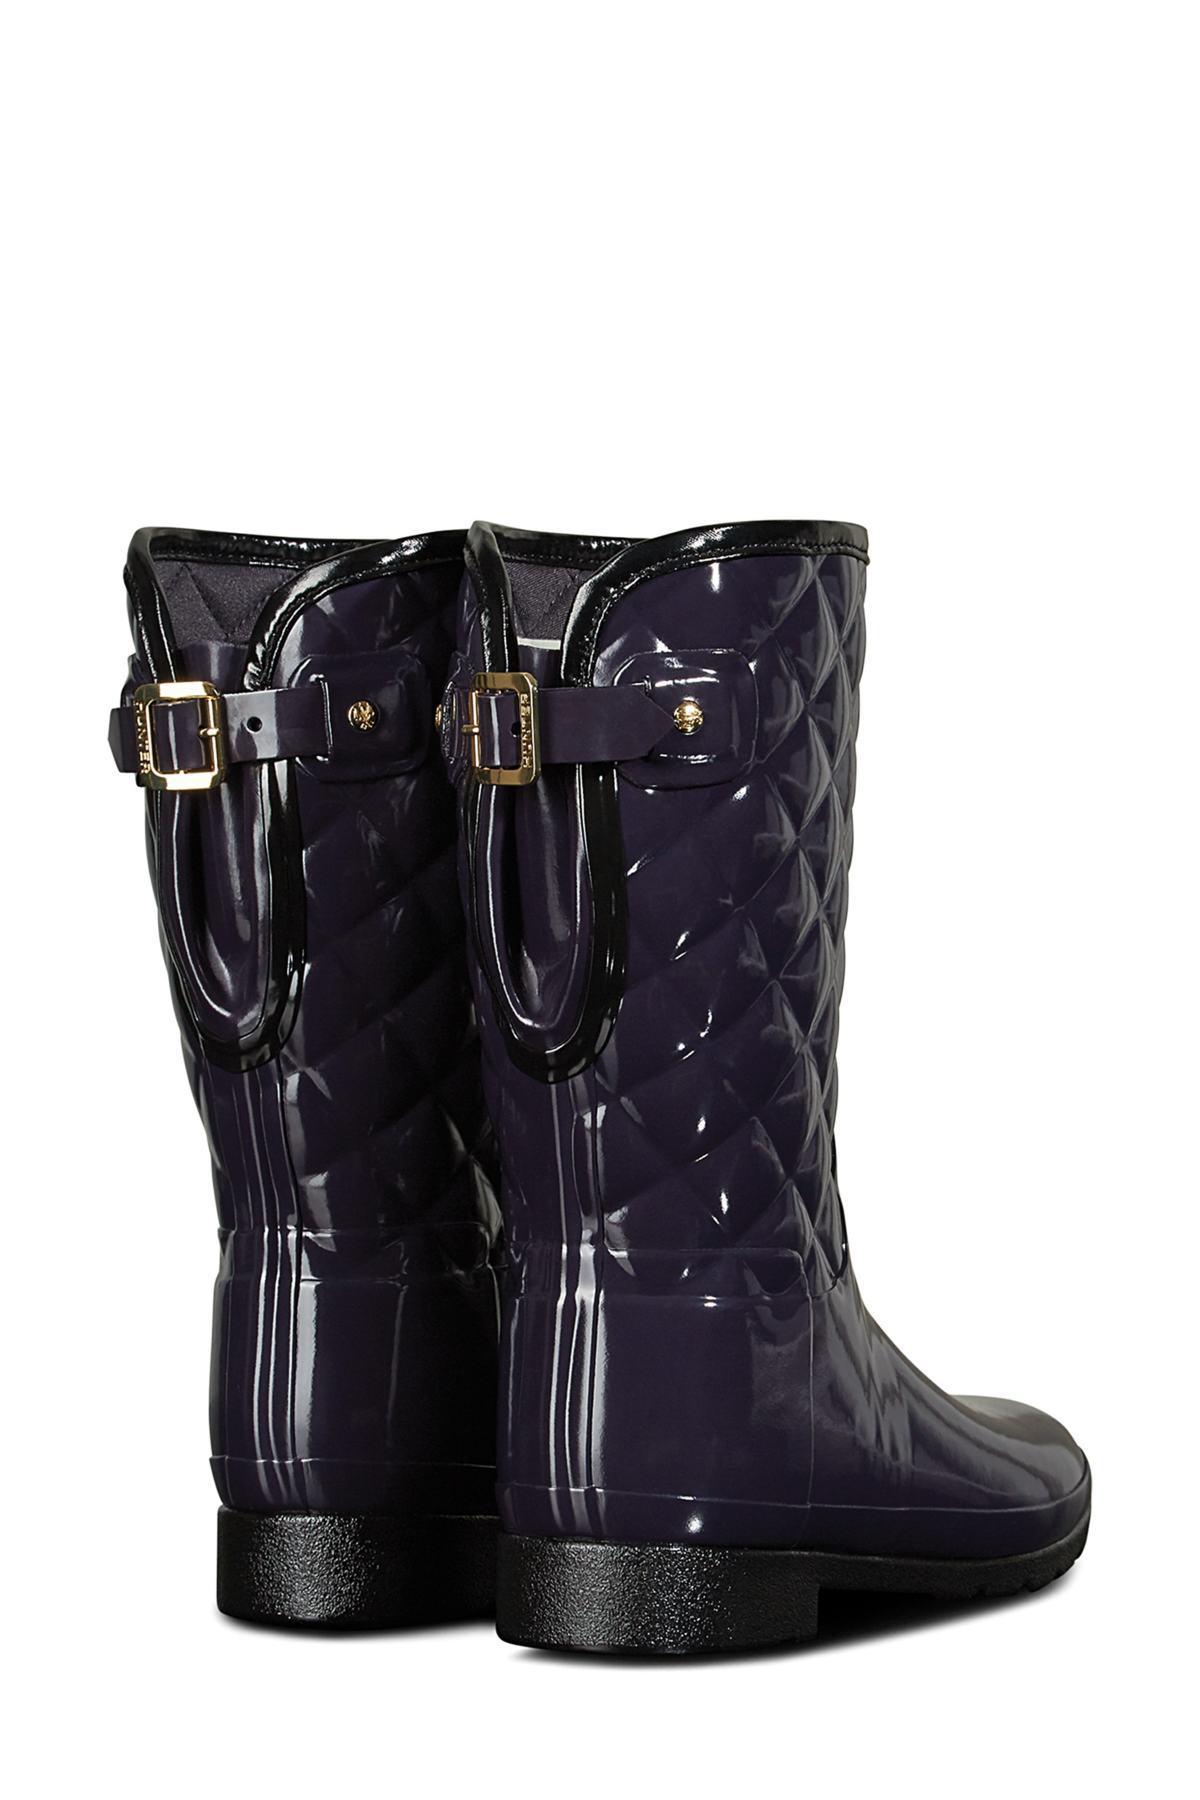 5704b043f761 Lyst - HUNTER Refined High Gloss Quilted Short Waterproof Rain Boot ...